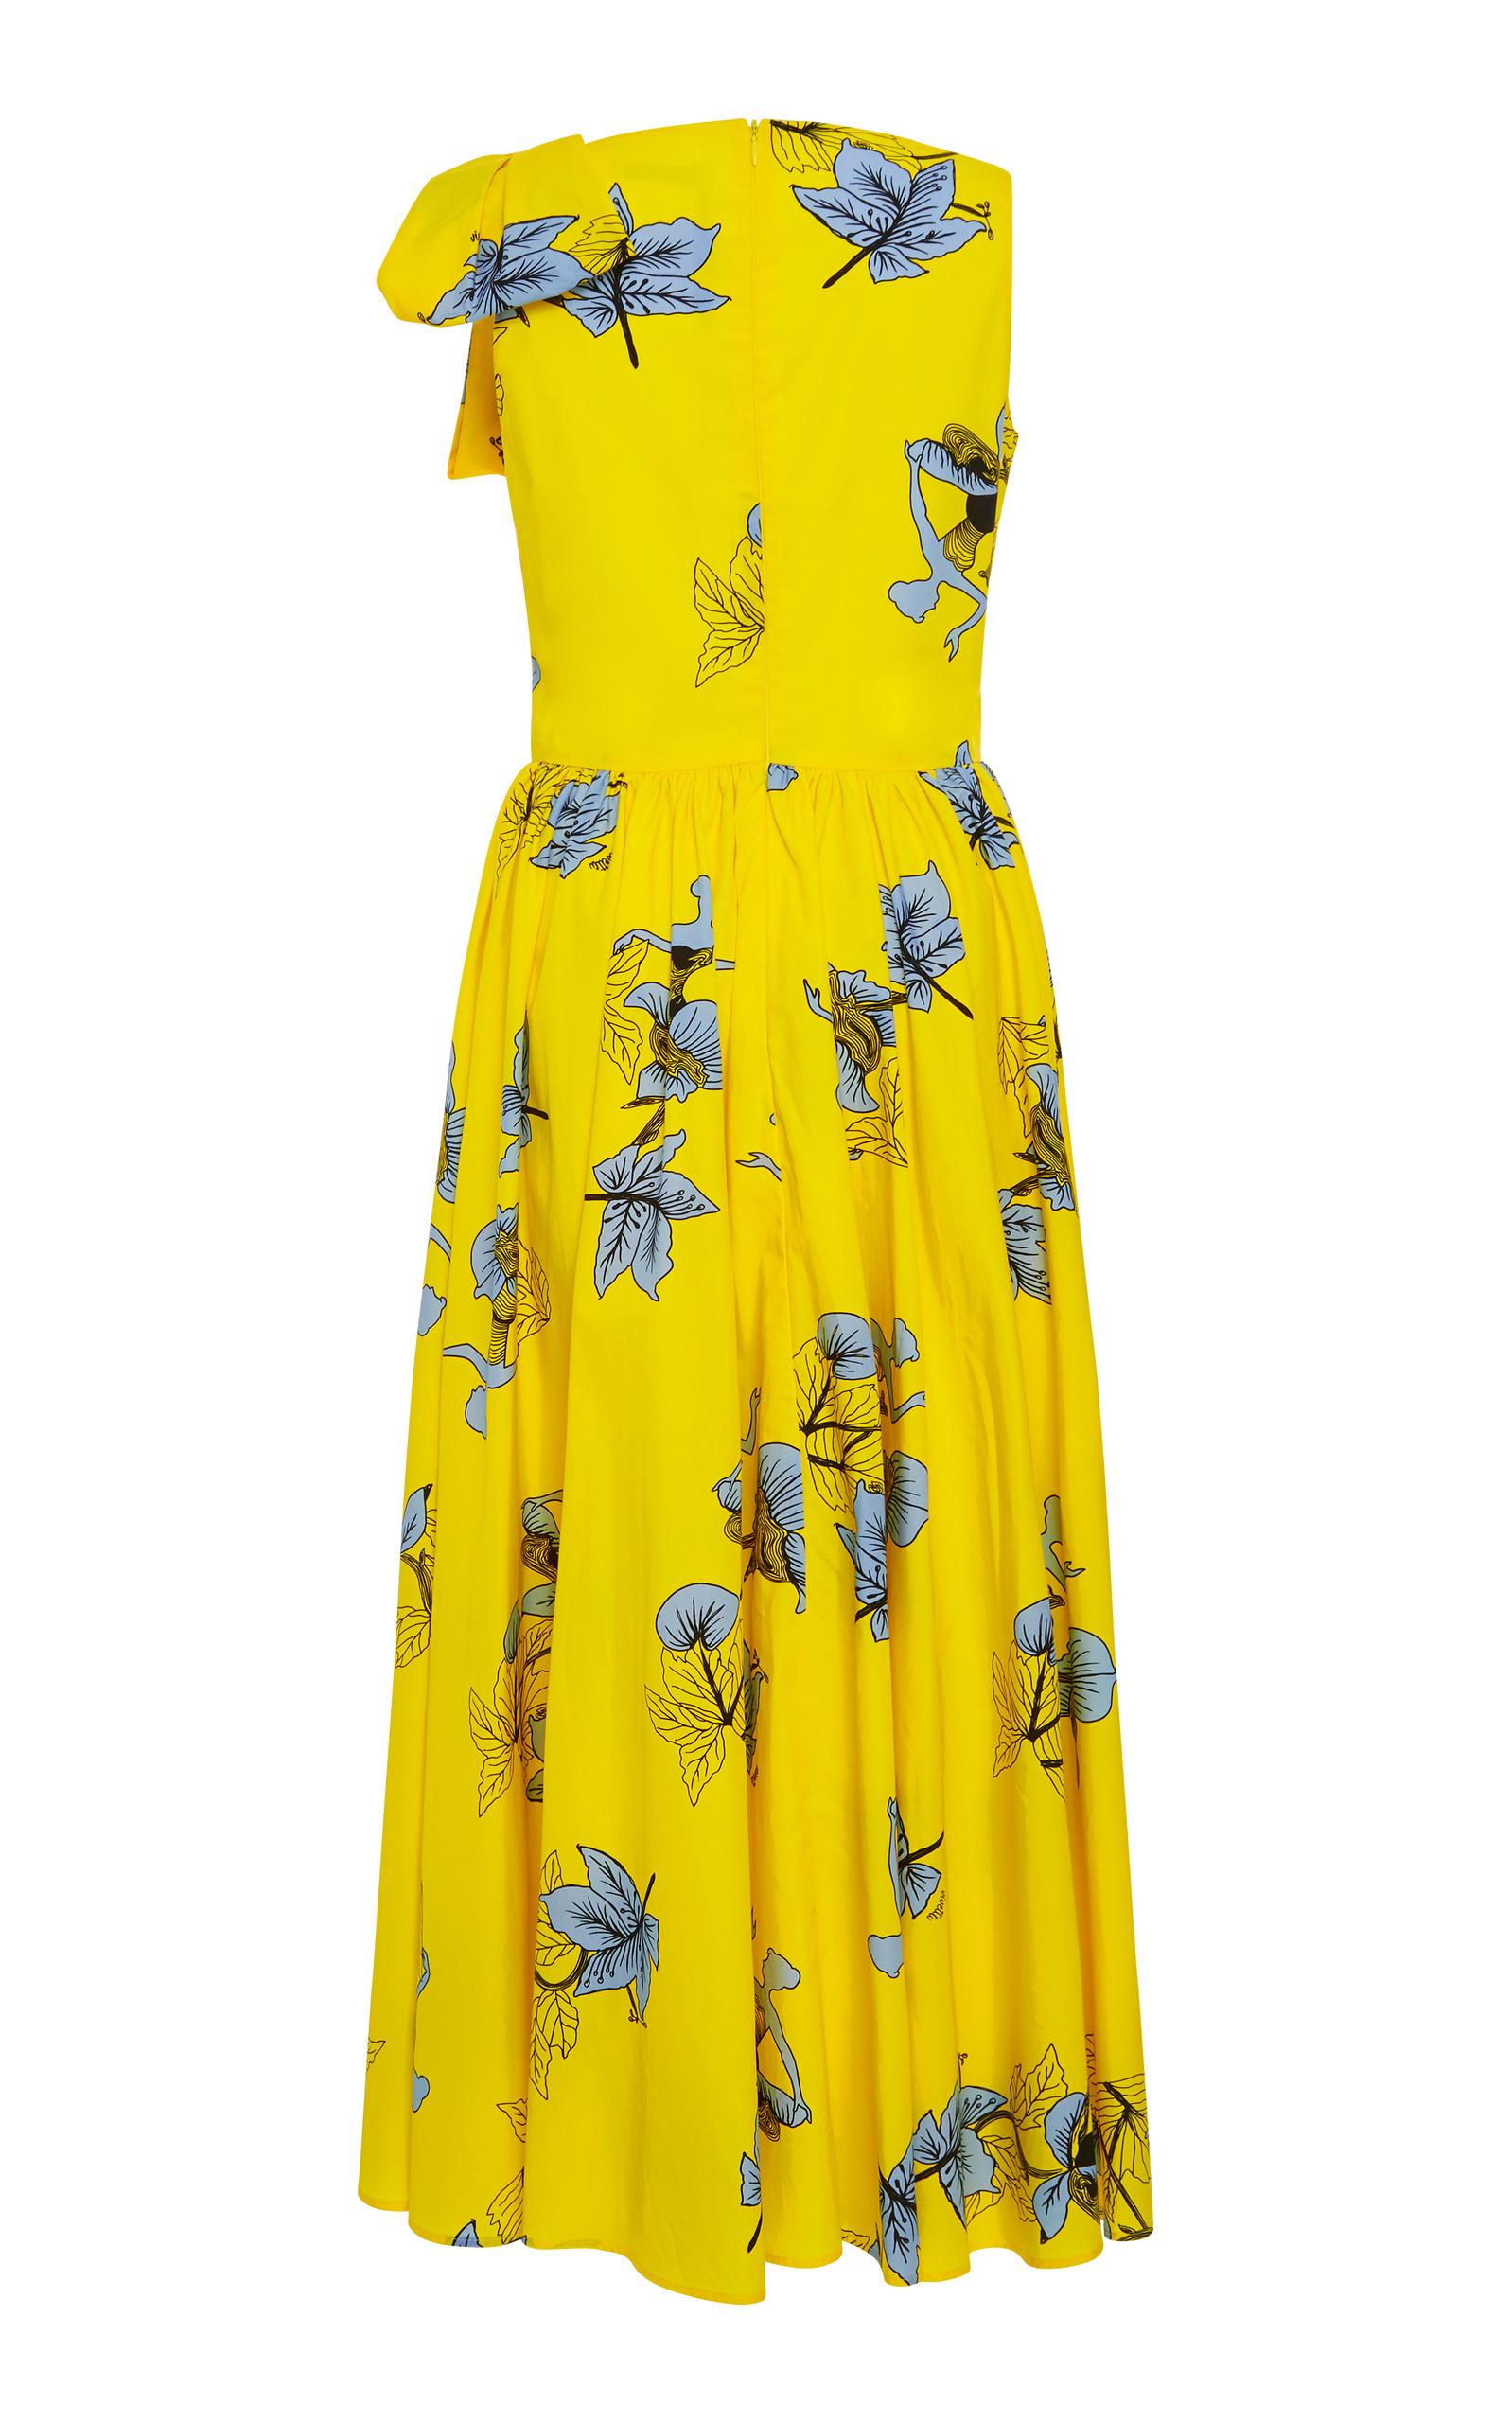 https://assets13.modaoperandi.com/images/products/613524/205835/f/large_vivetta-yellow-kajam-printed-cotton-dress.jpg?_v=1525378154